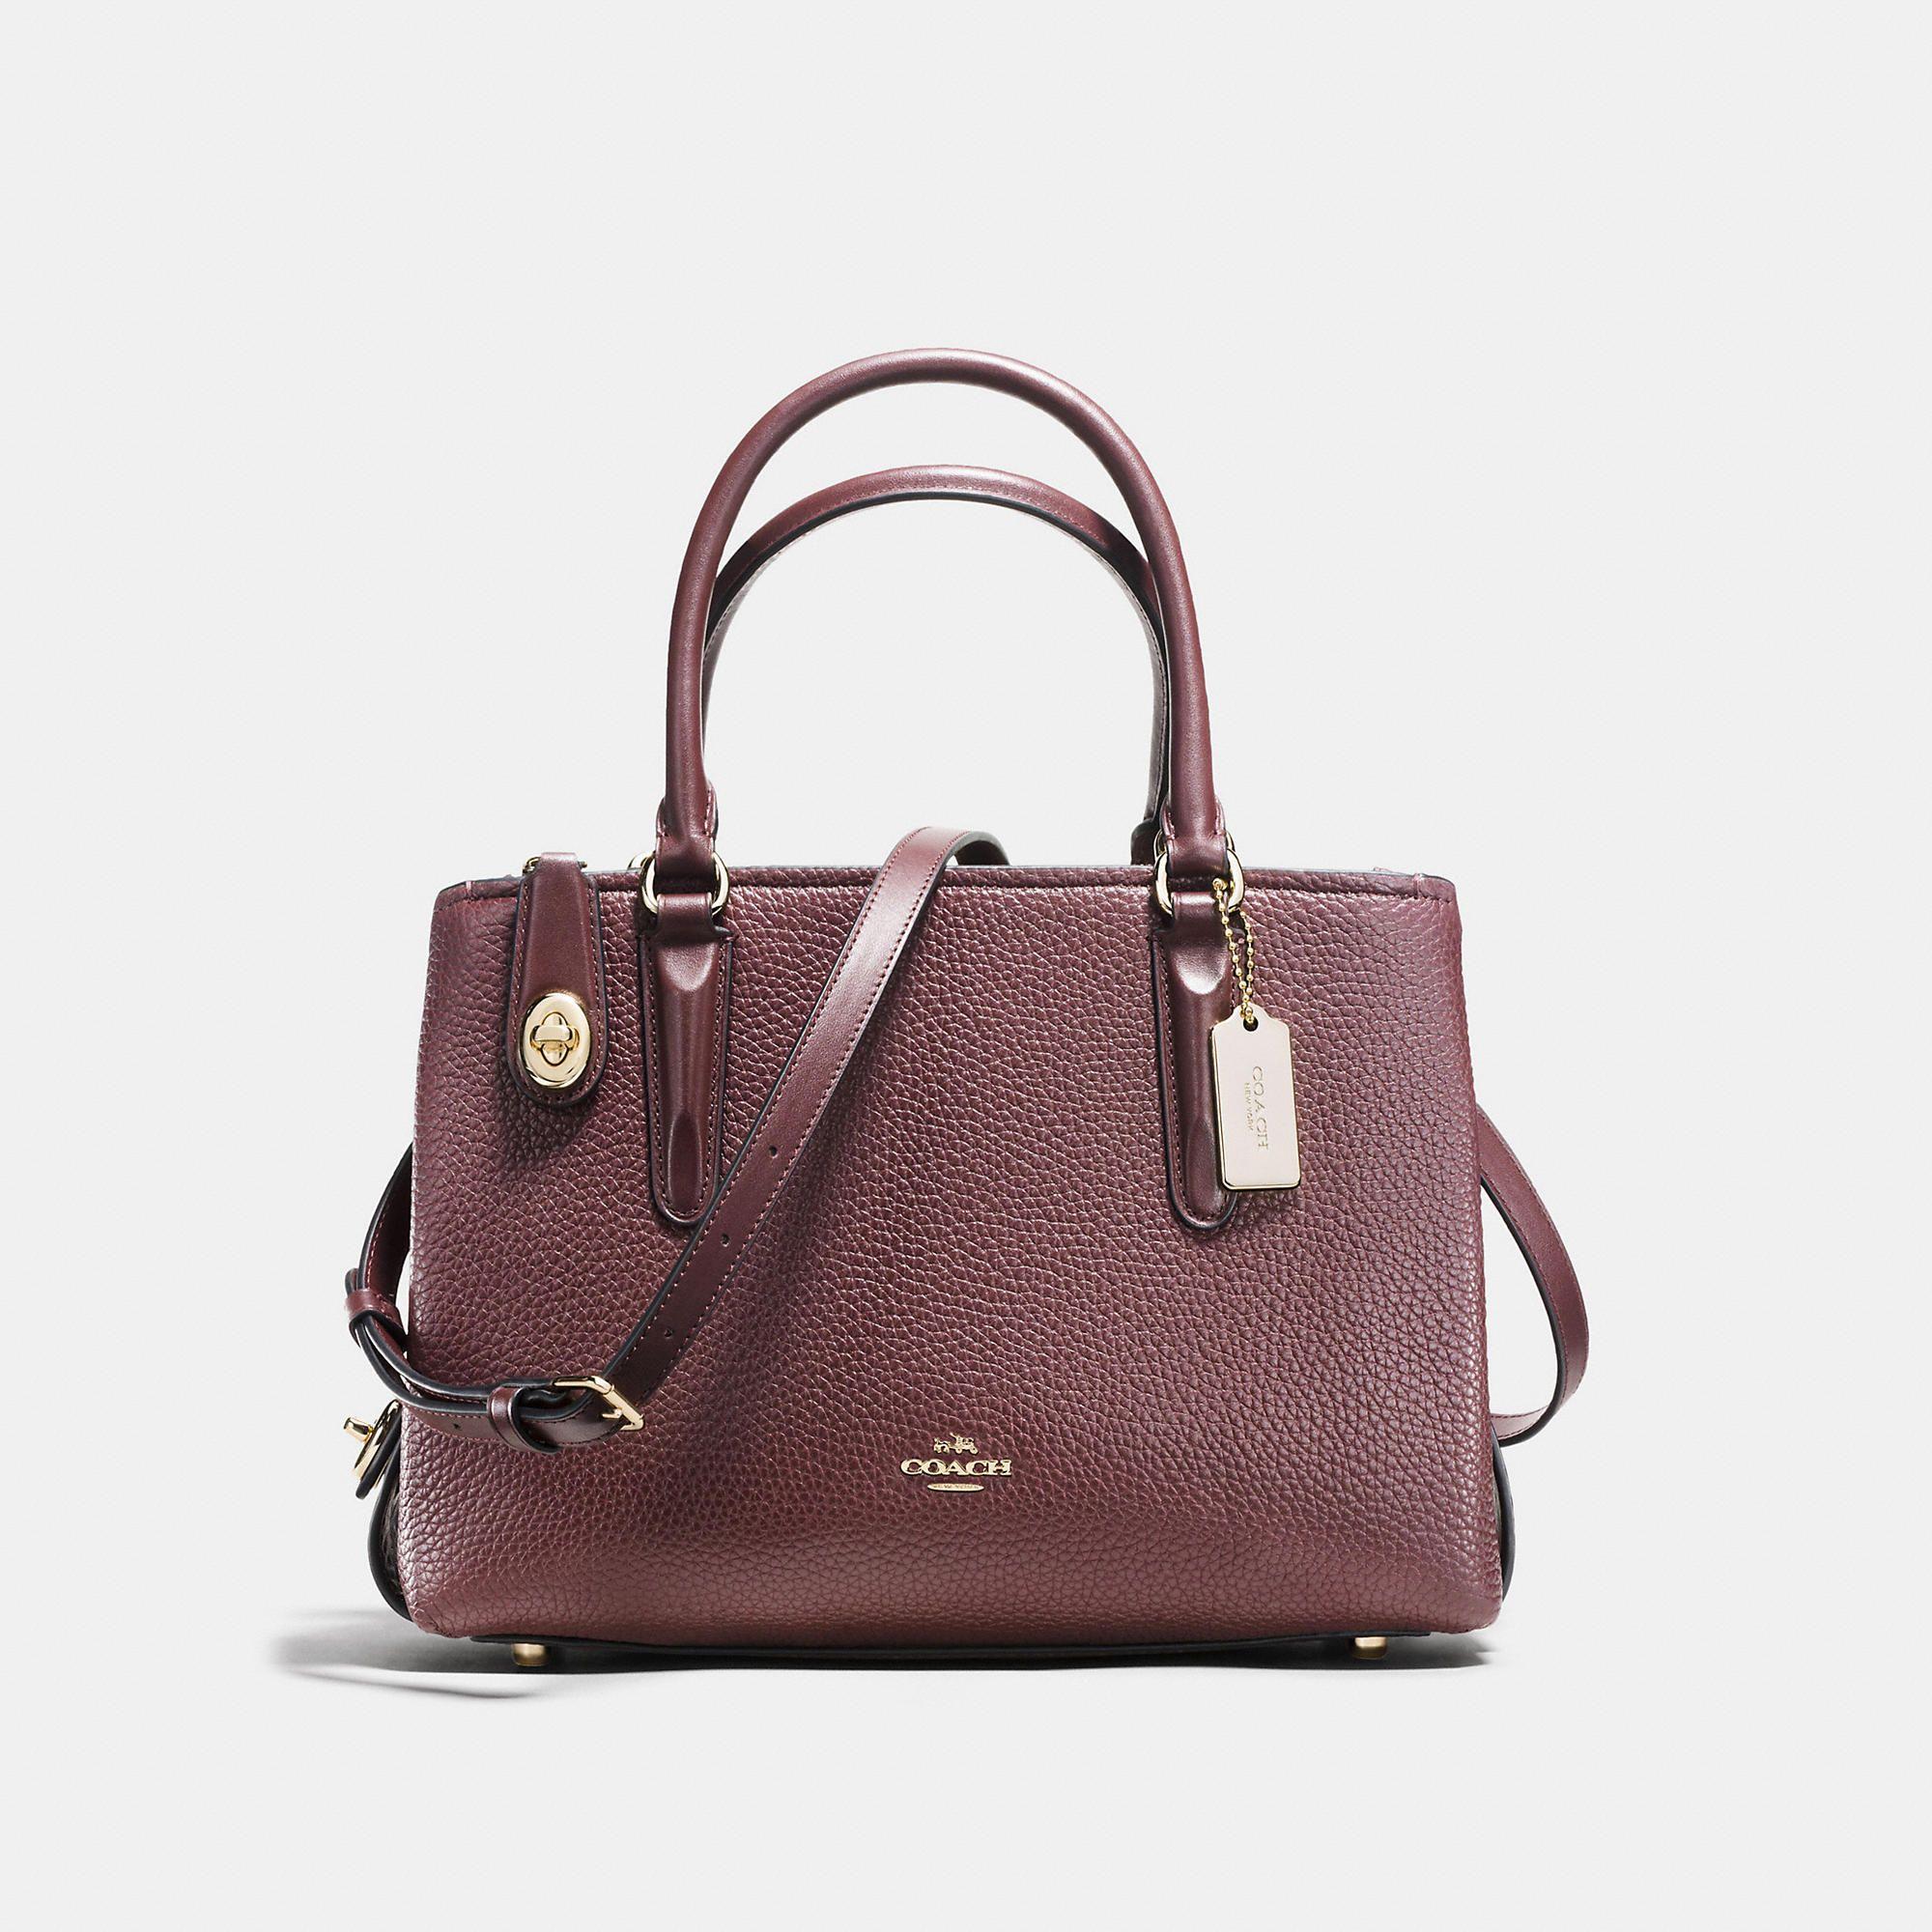 COACH Brooklyn Carryall 28 - Women s Designer Handbags  6eef083d4ad17